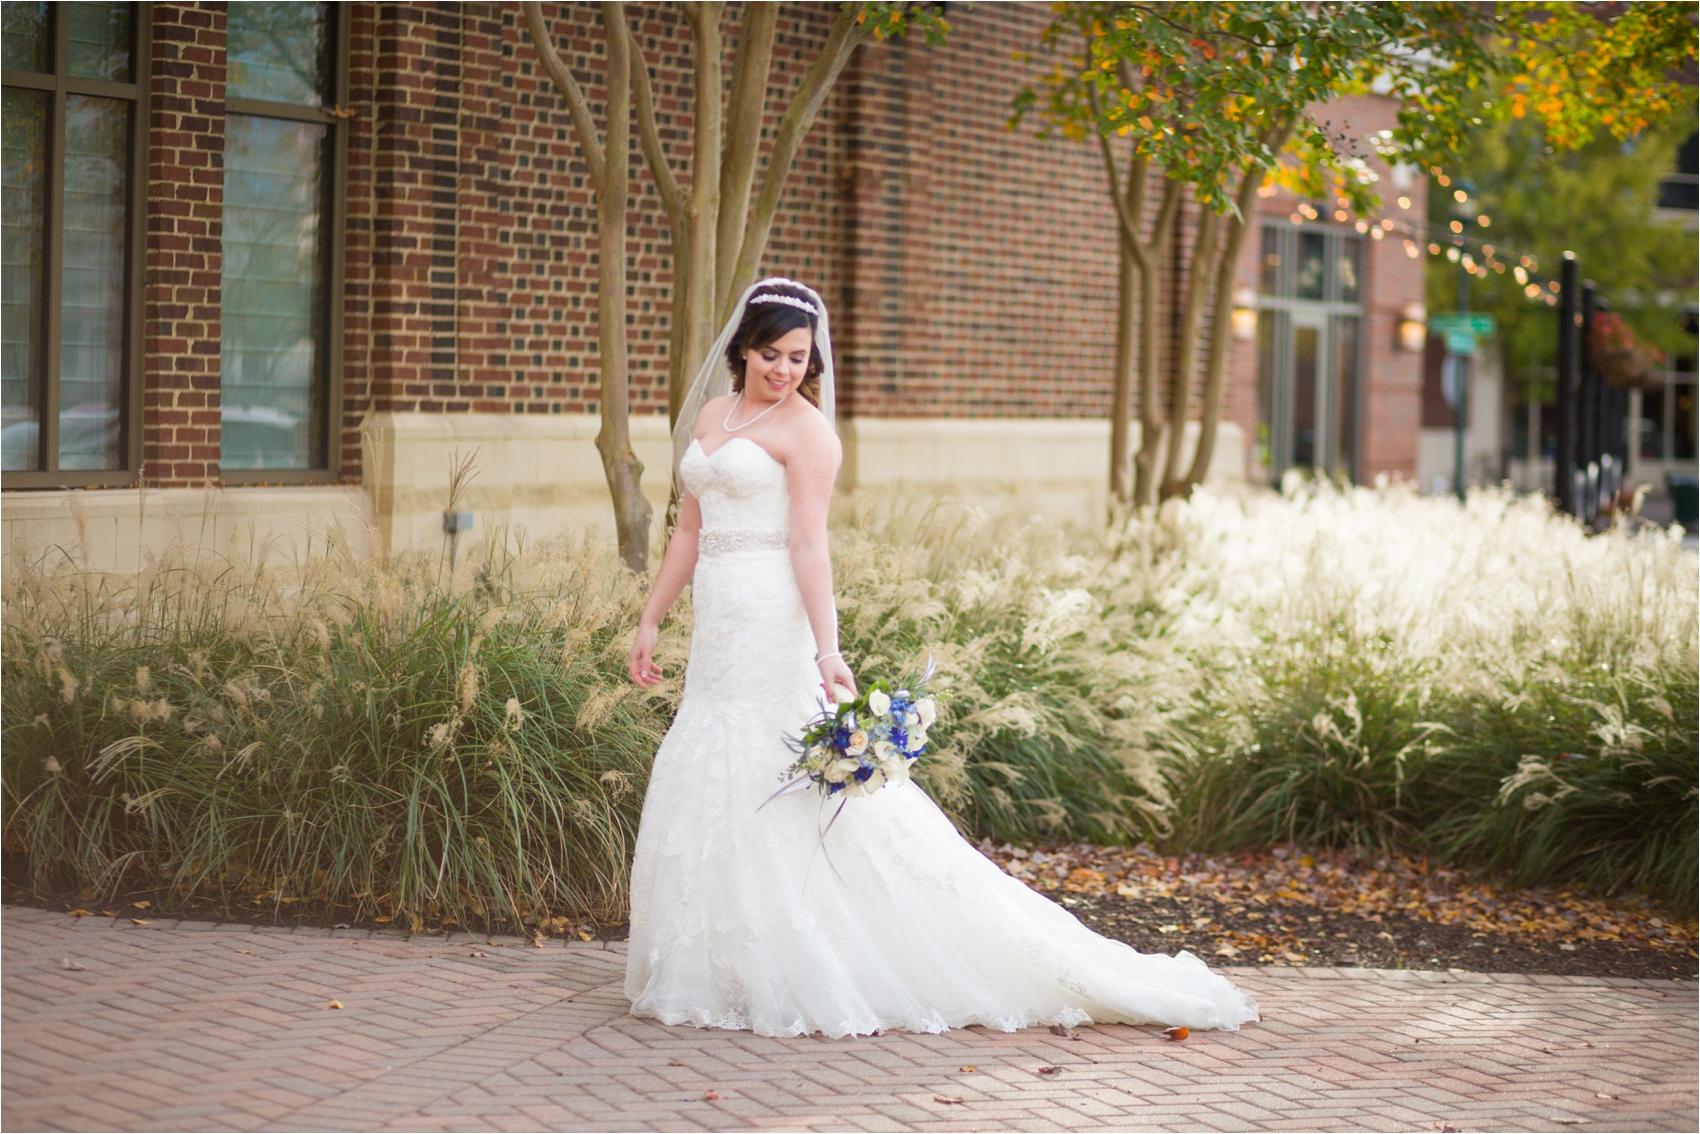 Newport-News-Winter-Wonderland-Wedding_0120.jpg